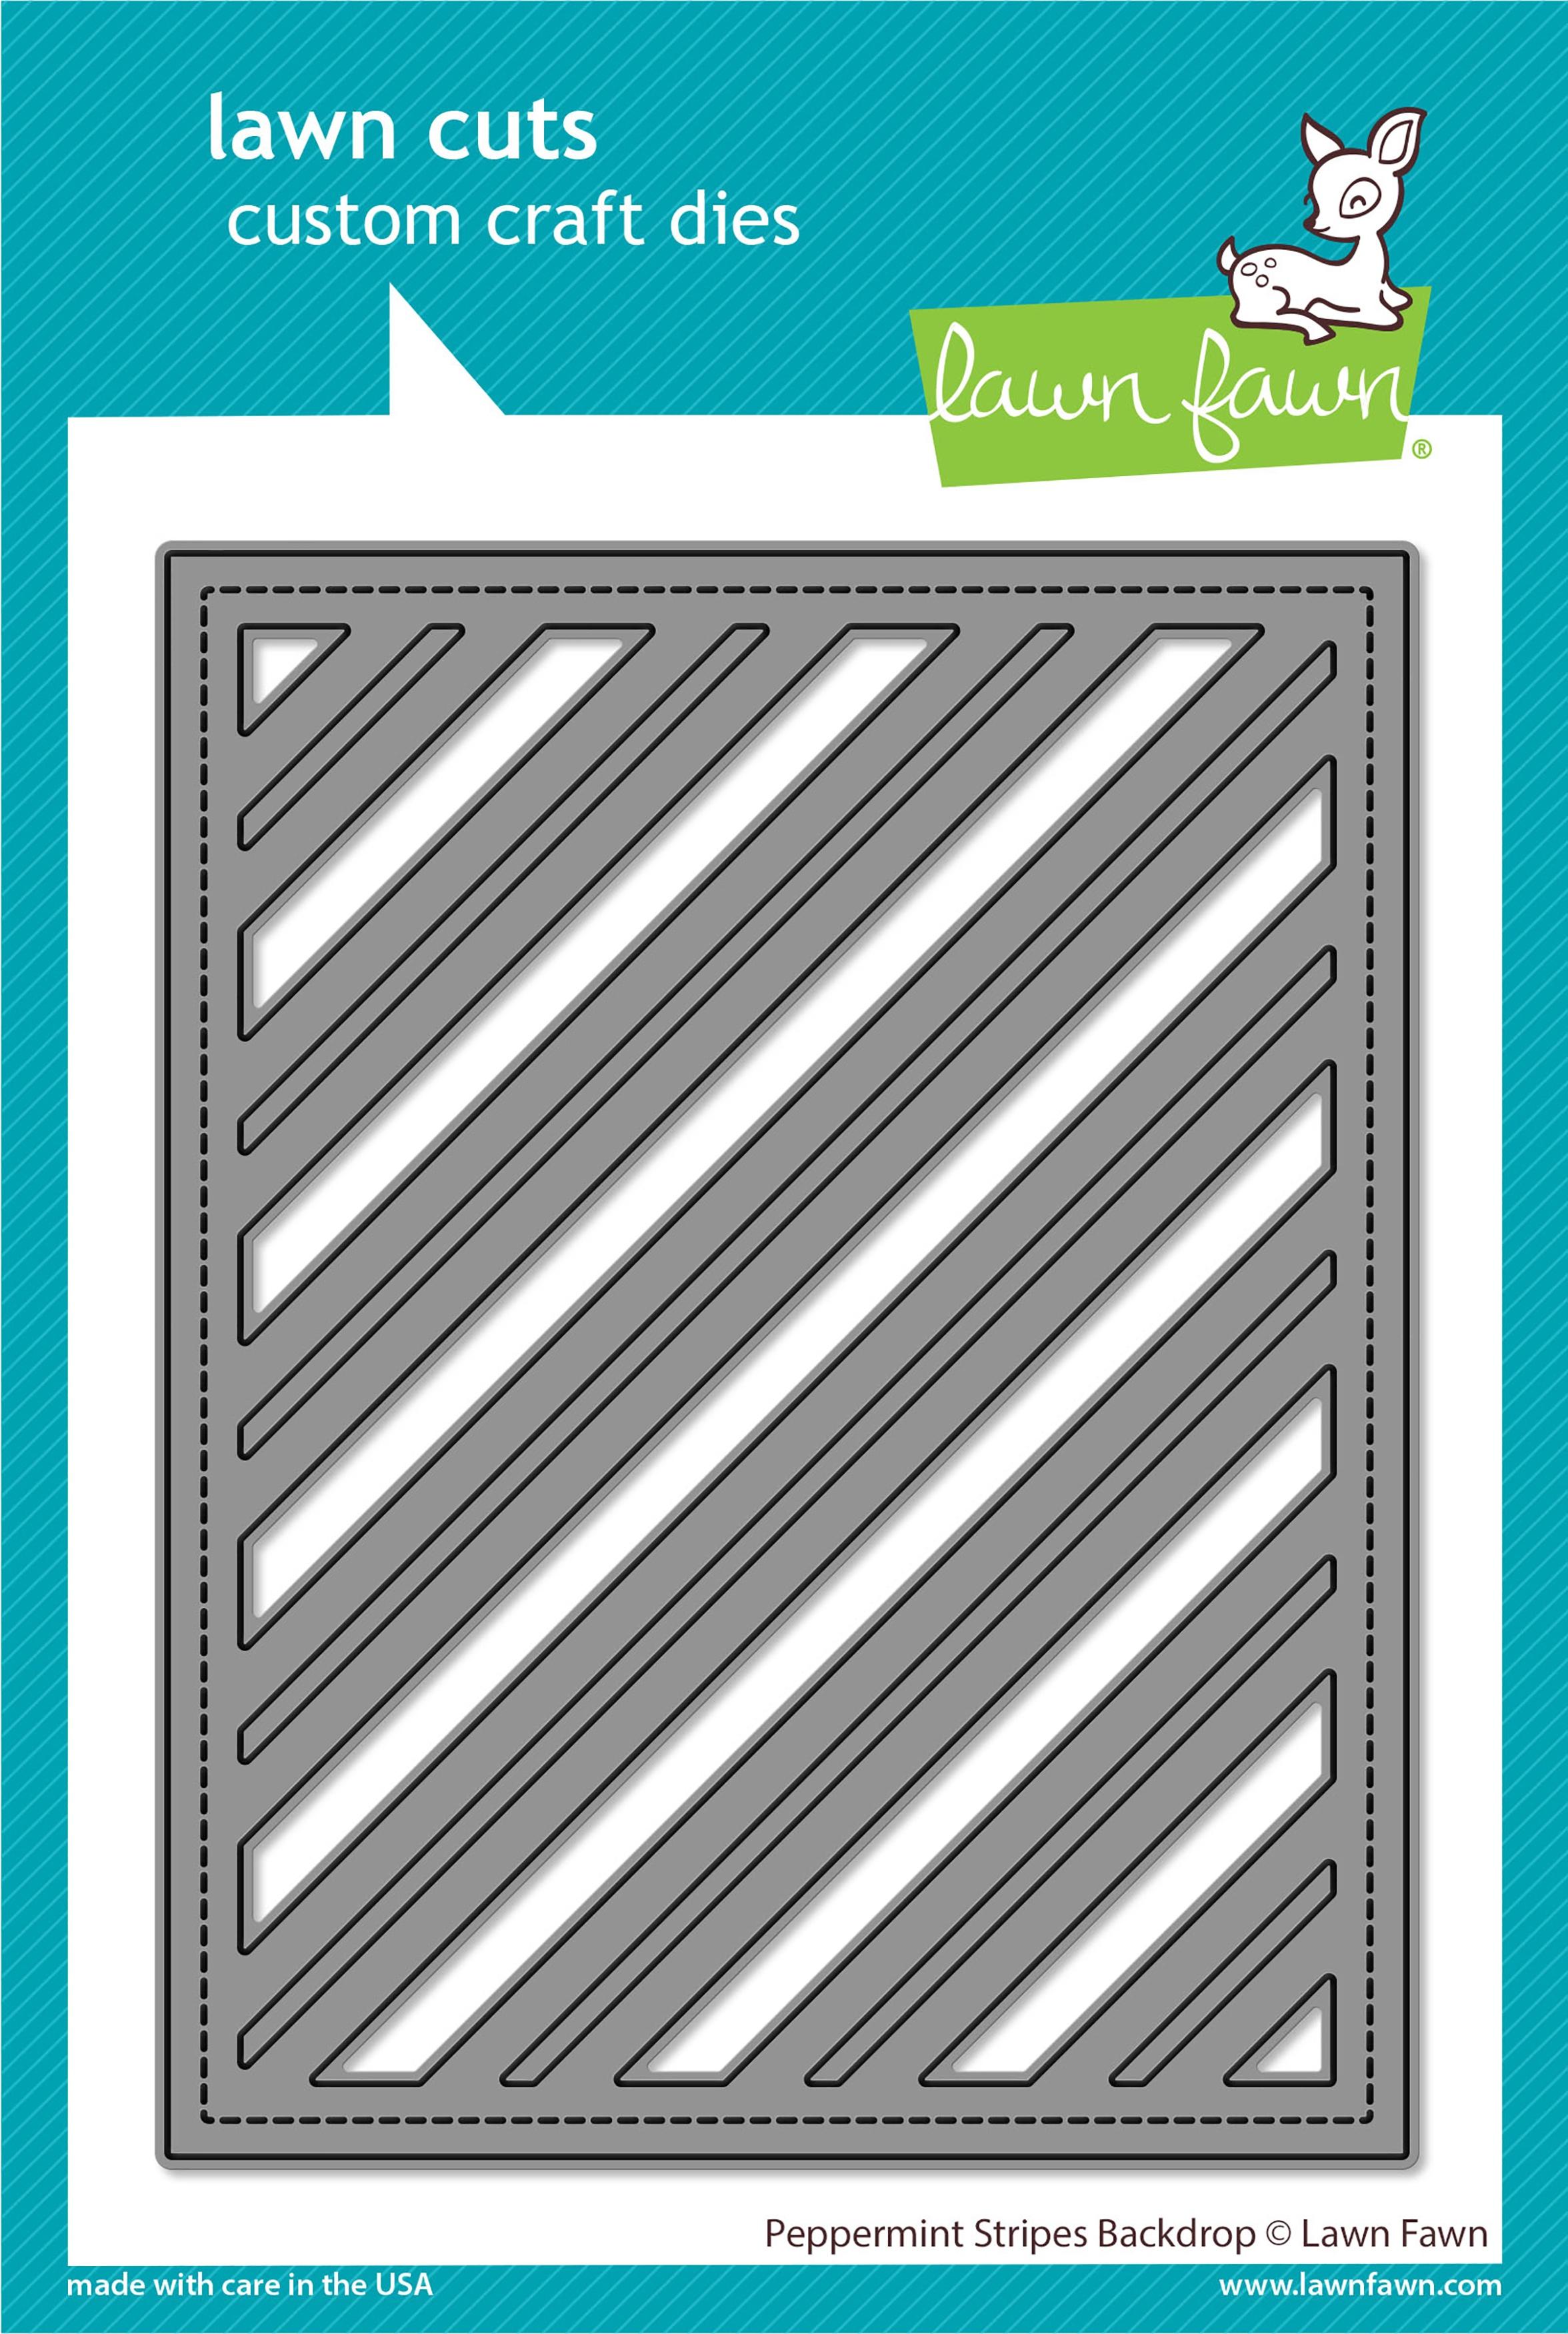 Lawn Cuts Custom Craft Die-Peppermint Stripes Backdrop